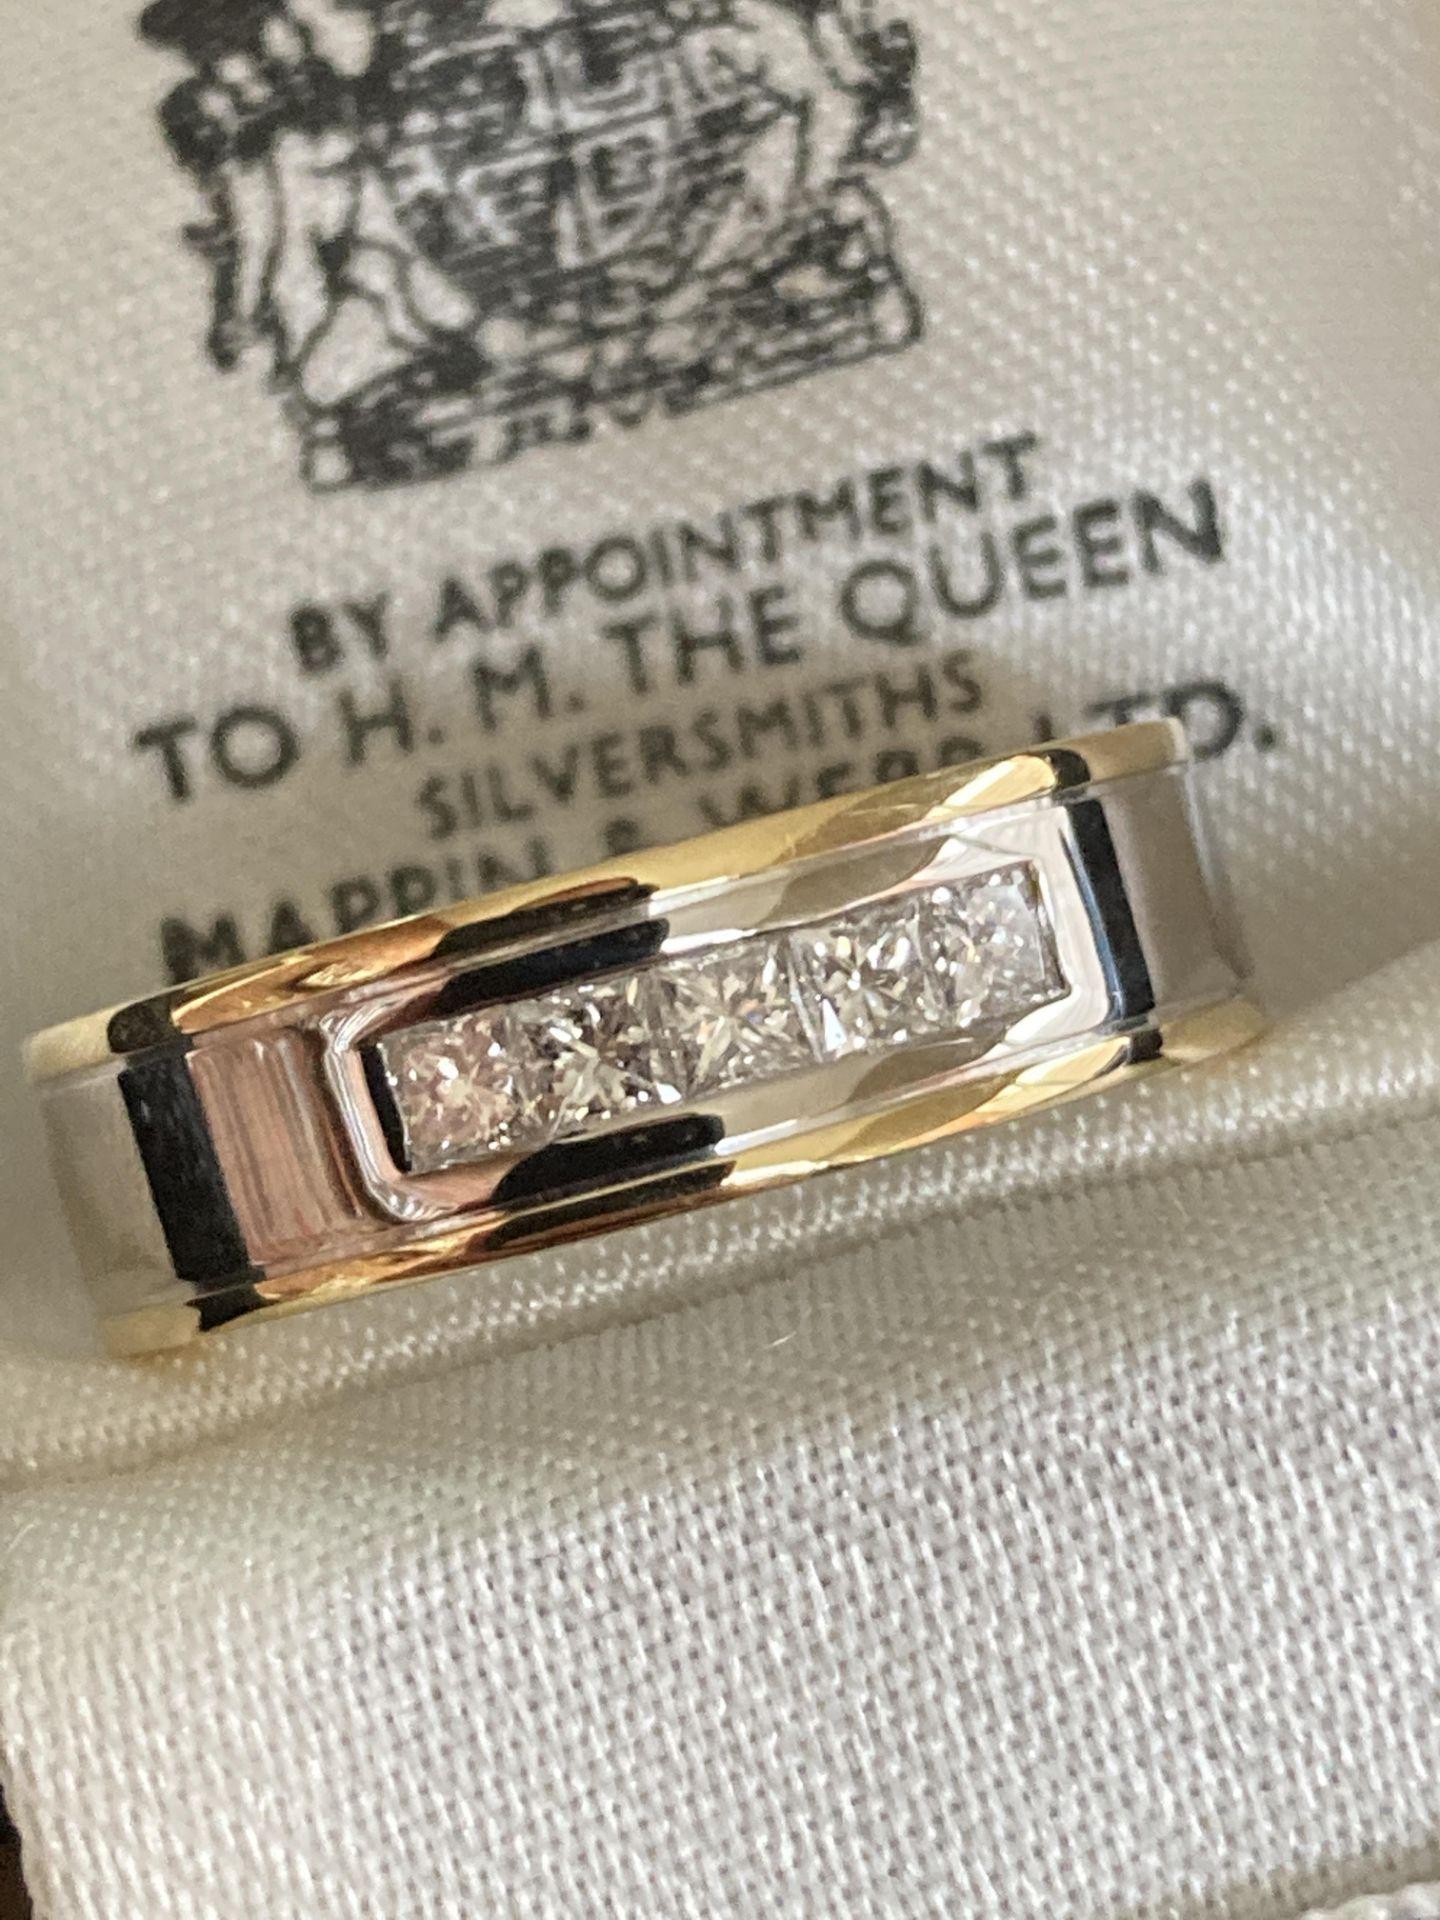 18CT MIXED GOLD DIAMOND RING (PRINCESS CUT) - SIZE: O 1/2 / WEIGHT: 8.9G - Image 3 of 3